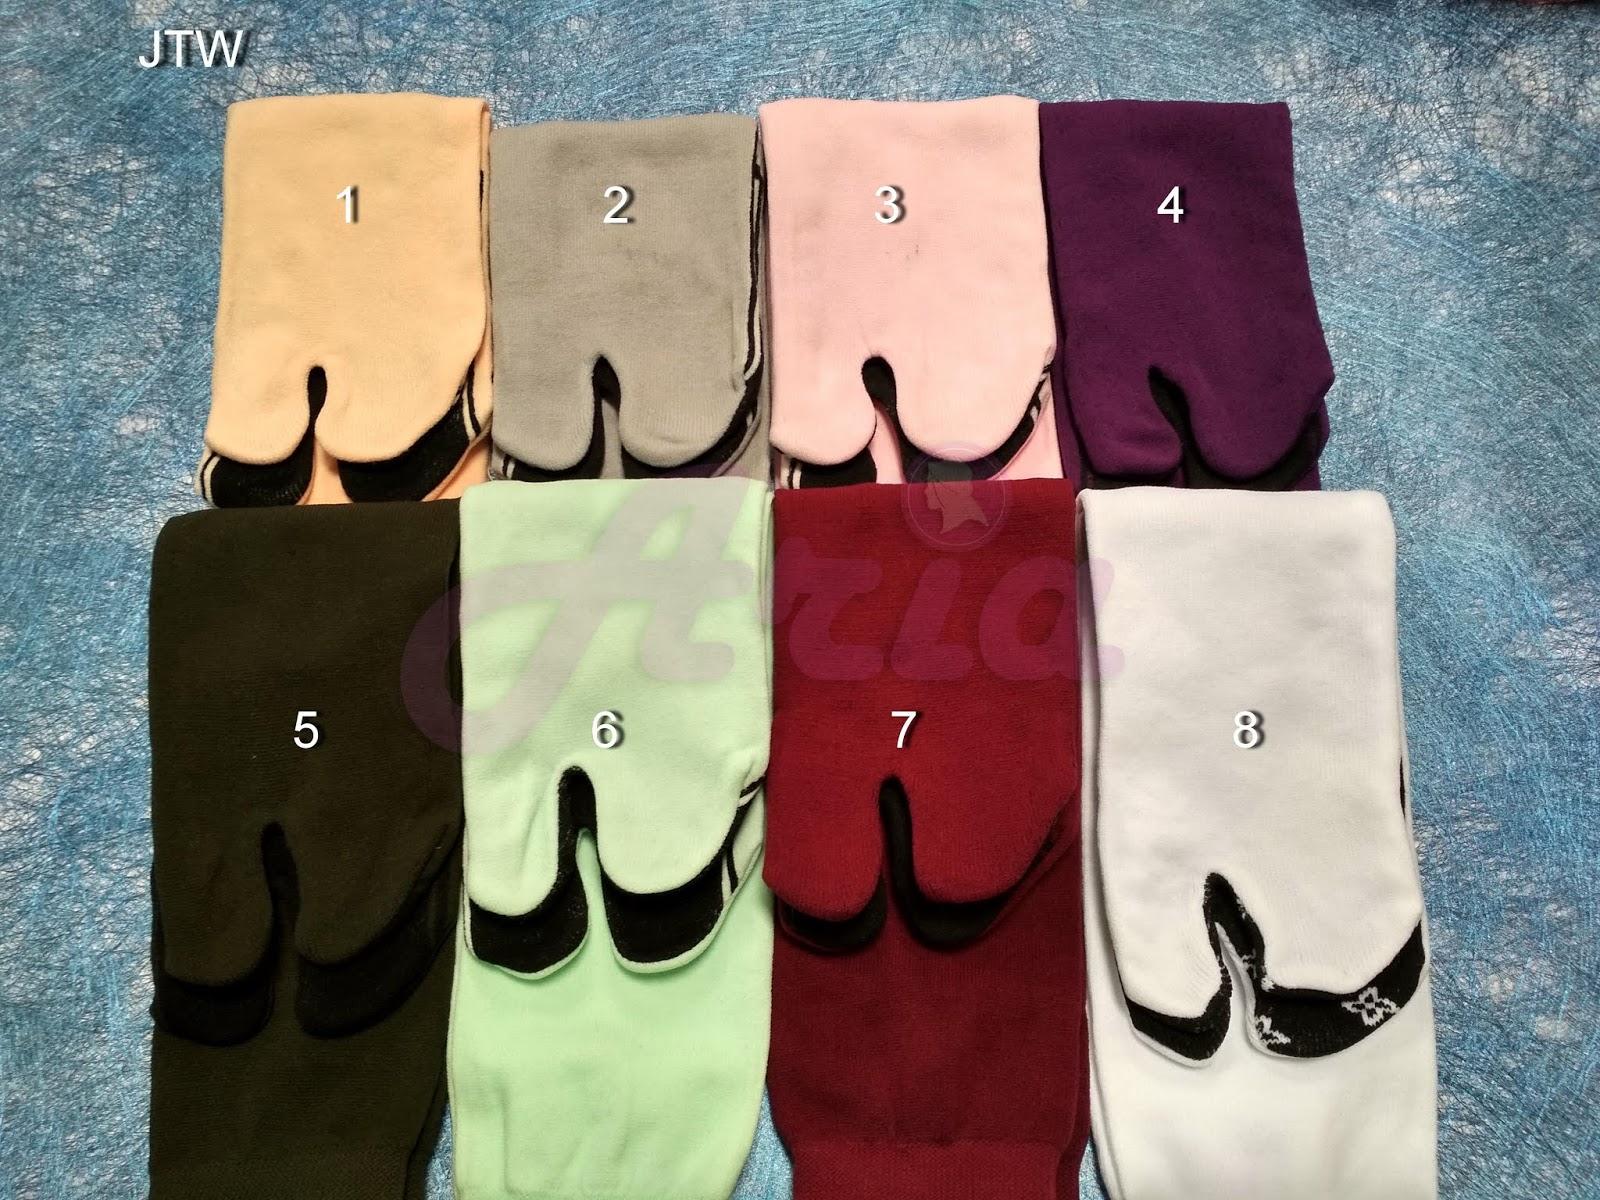 0857 3219 9455 Aria Store Jual Jilbab Fashion Distributor Hijab Grosir Kaos Kaki Muslim Jempol Tapak Hitam Muslimah Murah